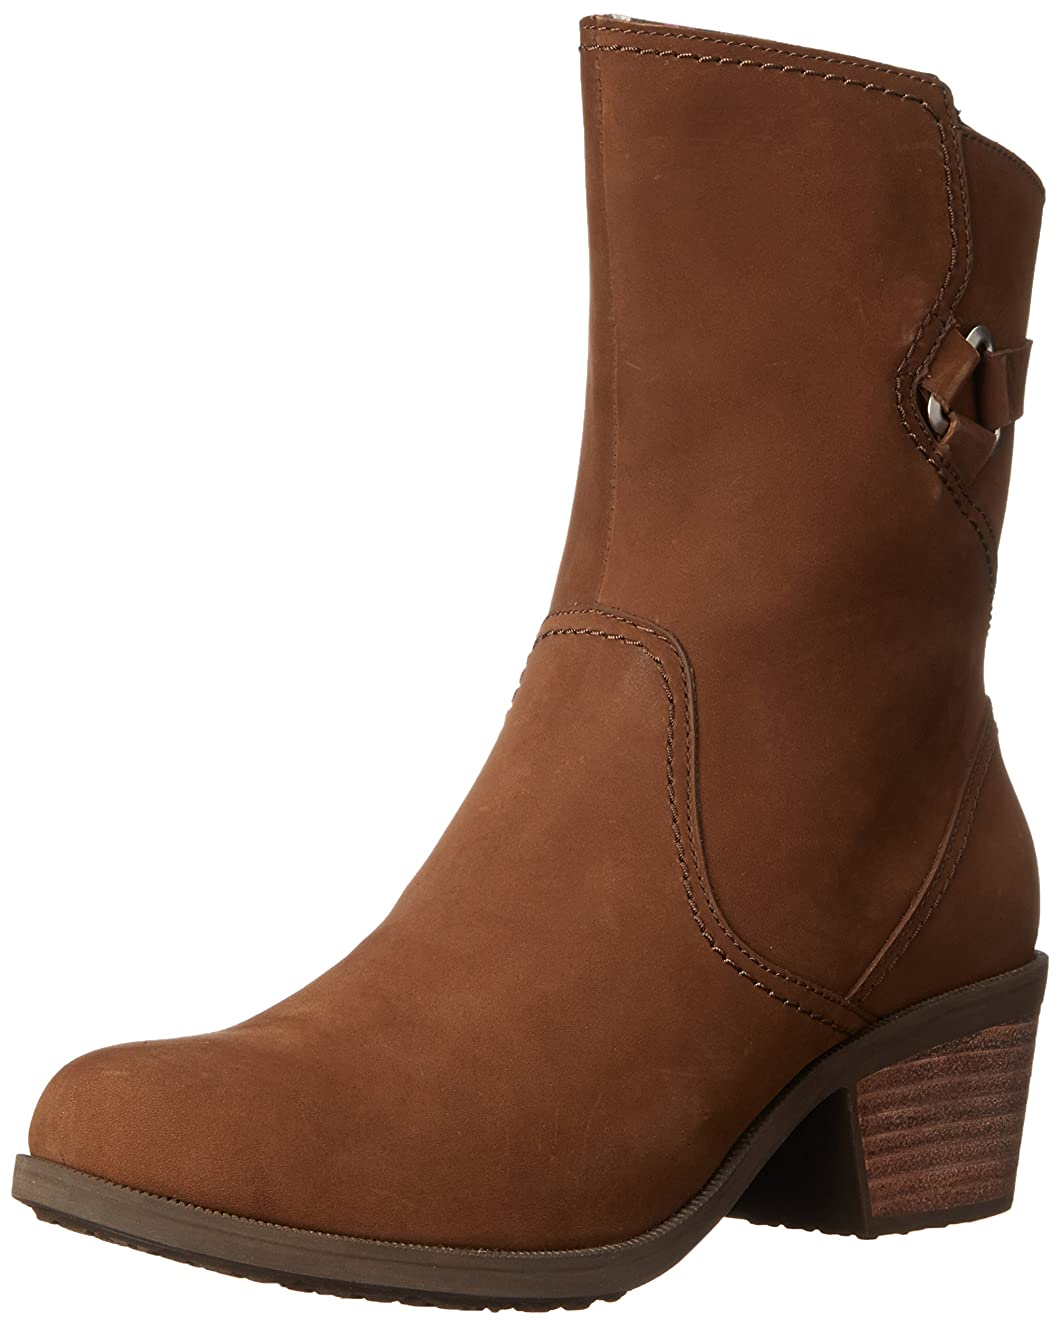 Teva Women's Foxy Mid-Calf Boot